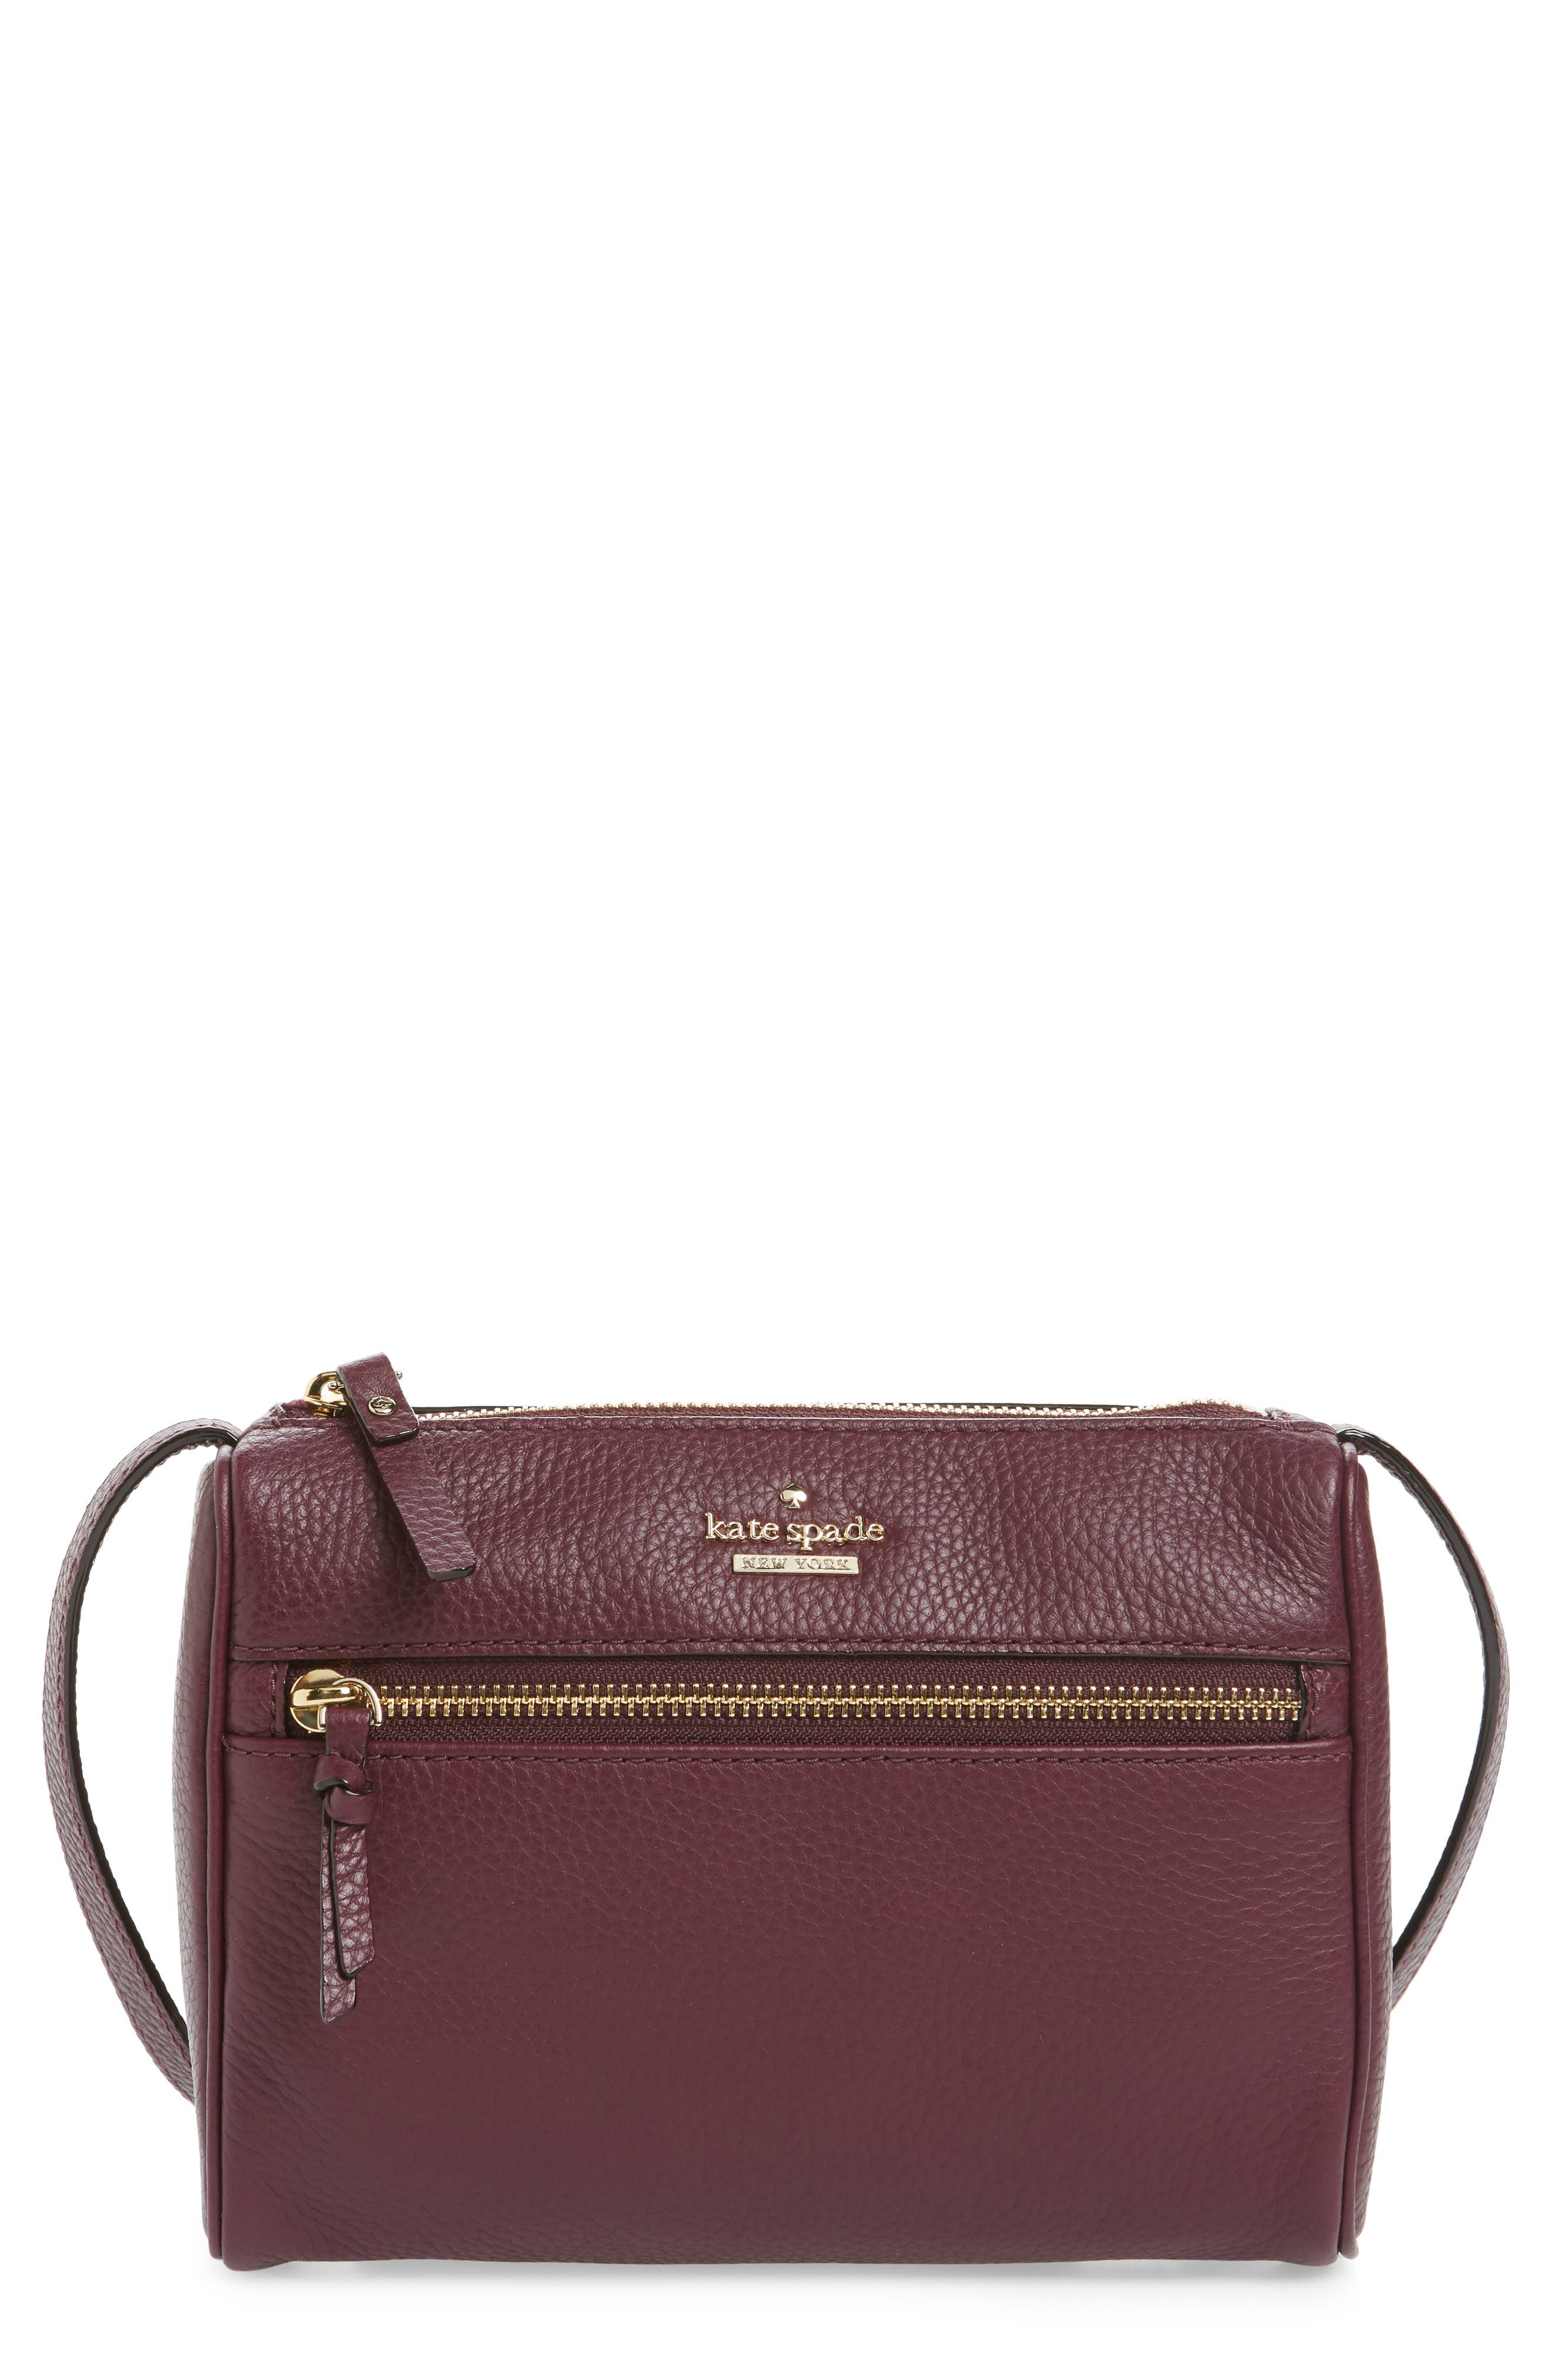 kate spade new york mini jackson street - cayli crossbody bag